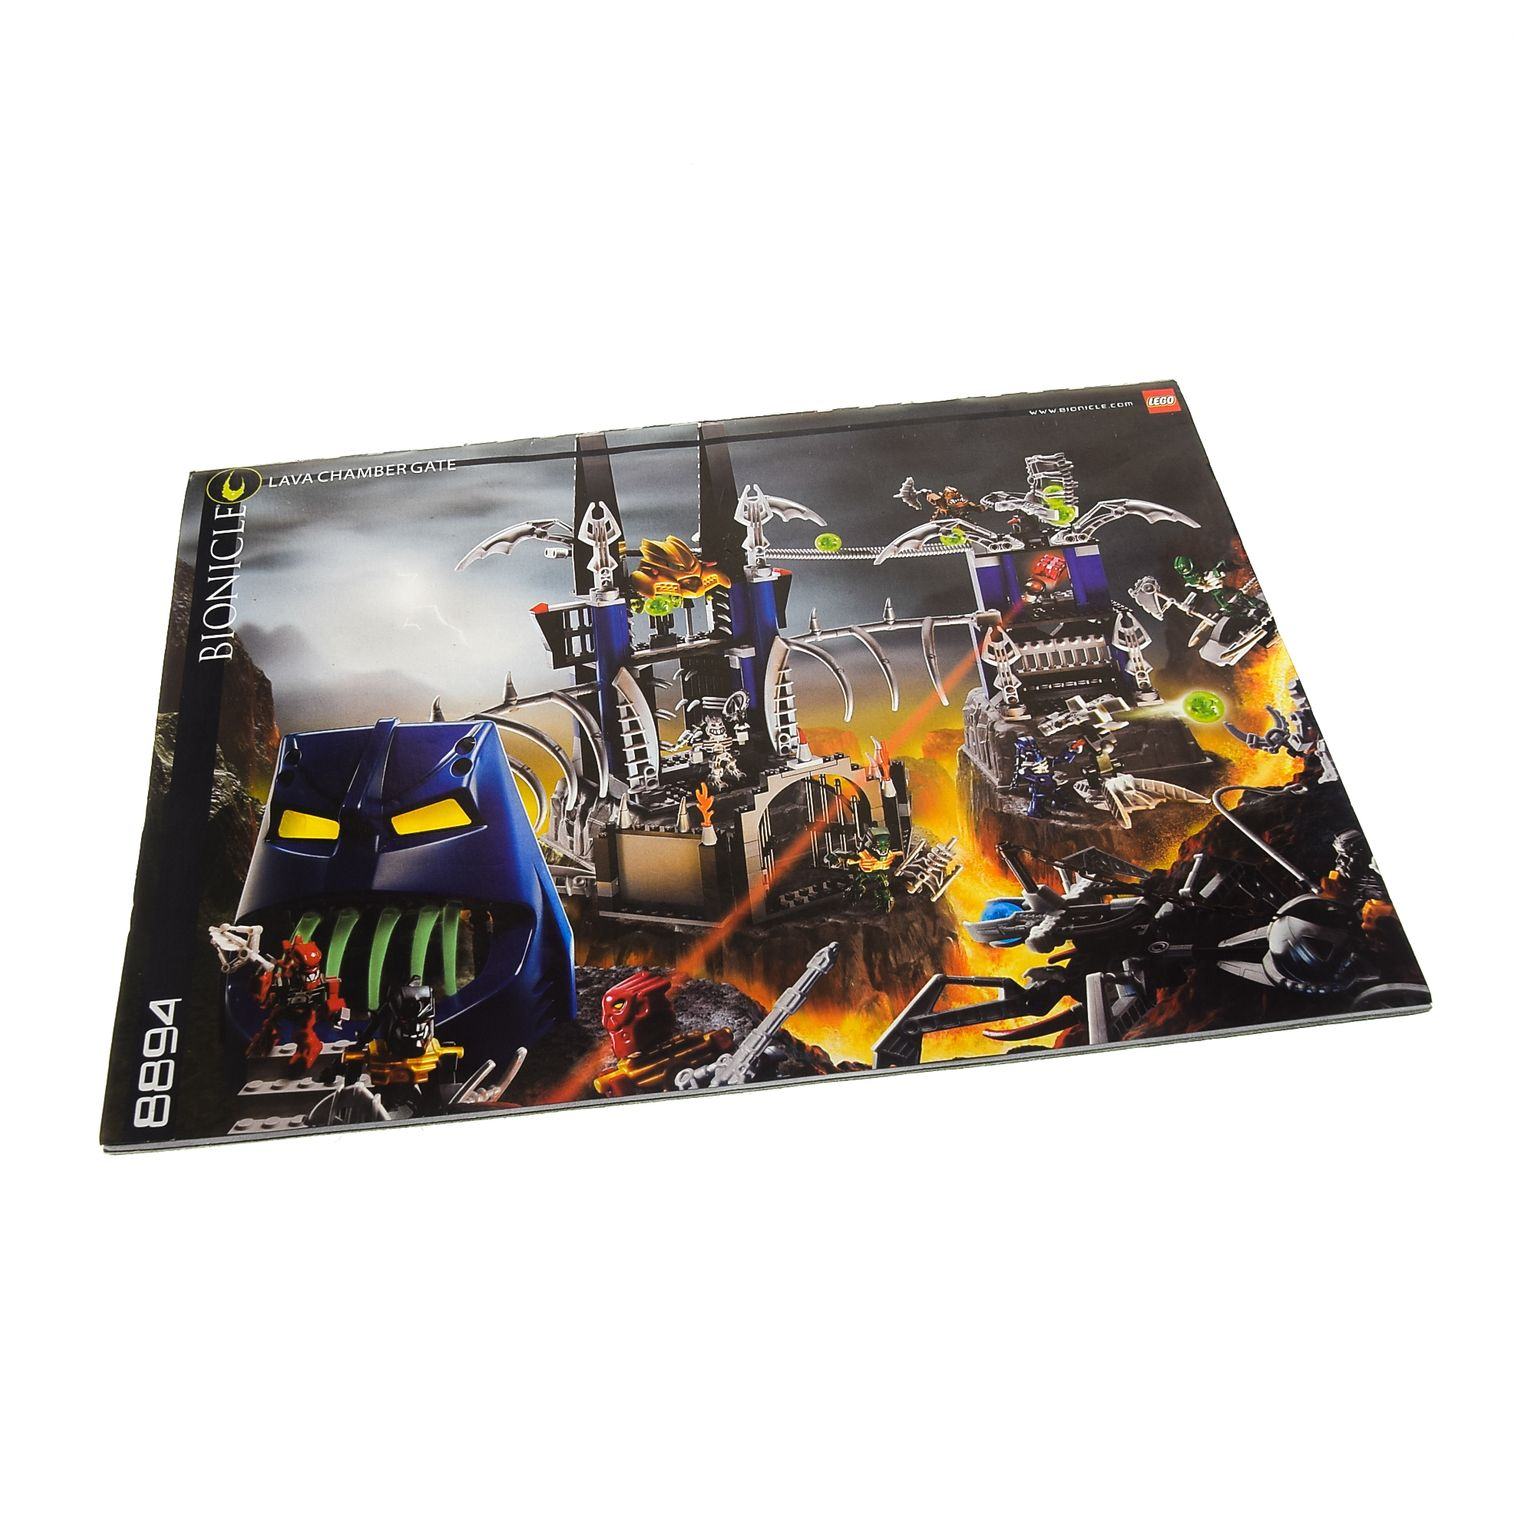 1 X Lego Bionicle Bauanleitung A4 Piraka Festung 8894